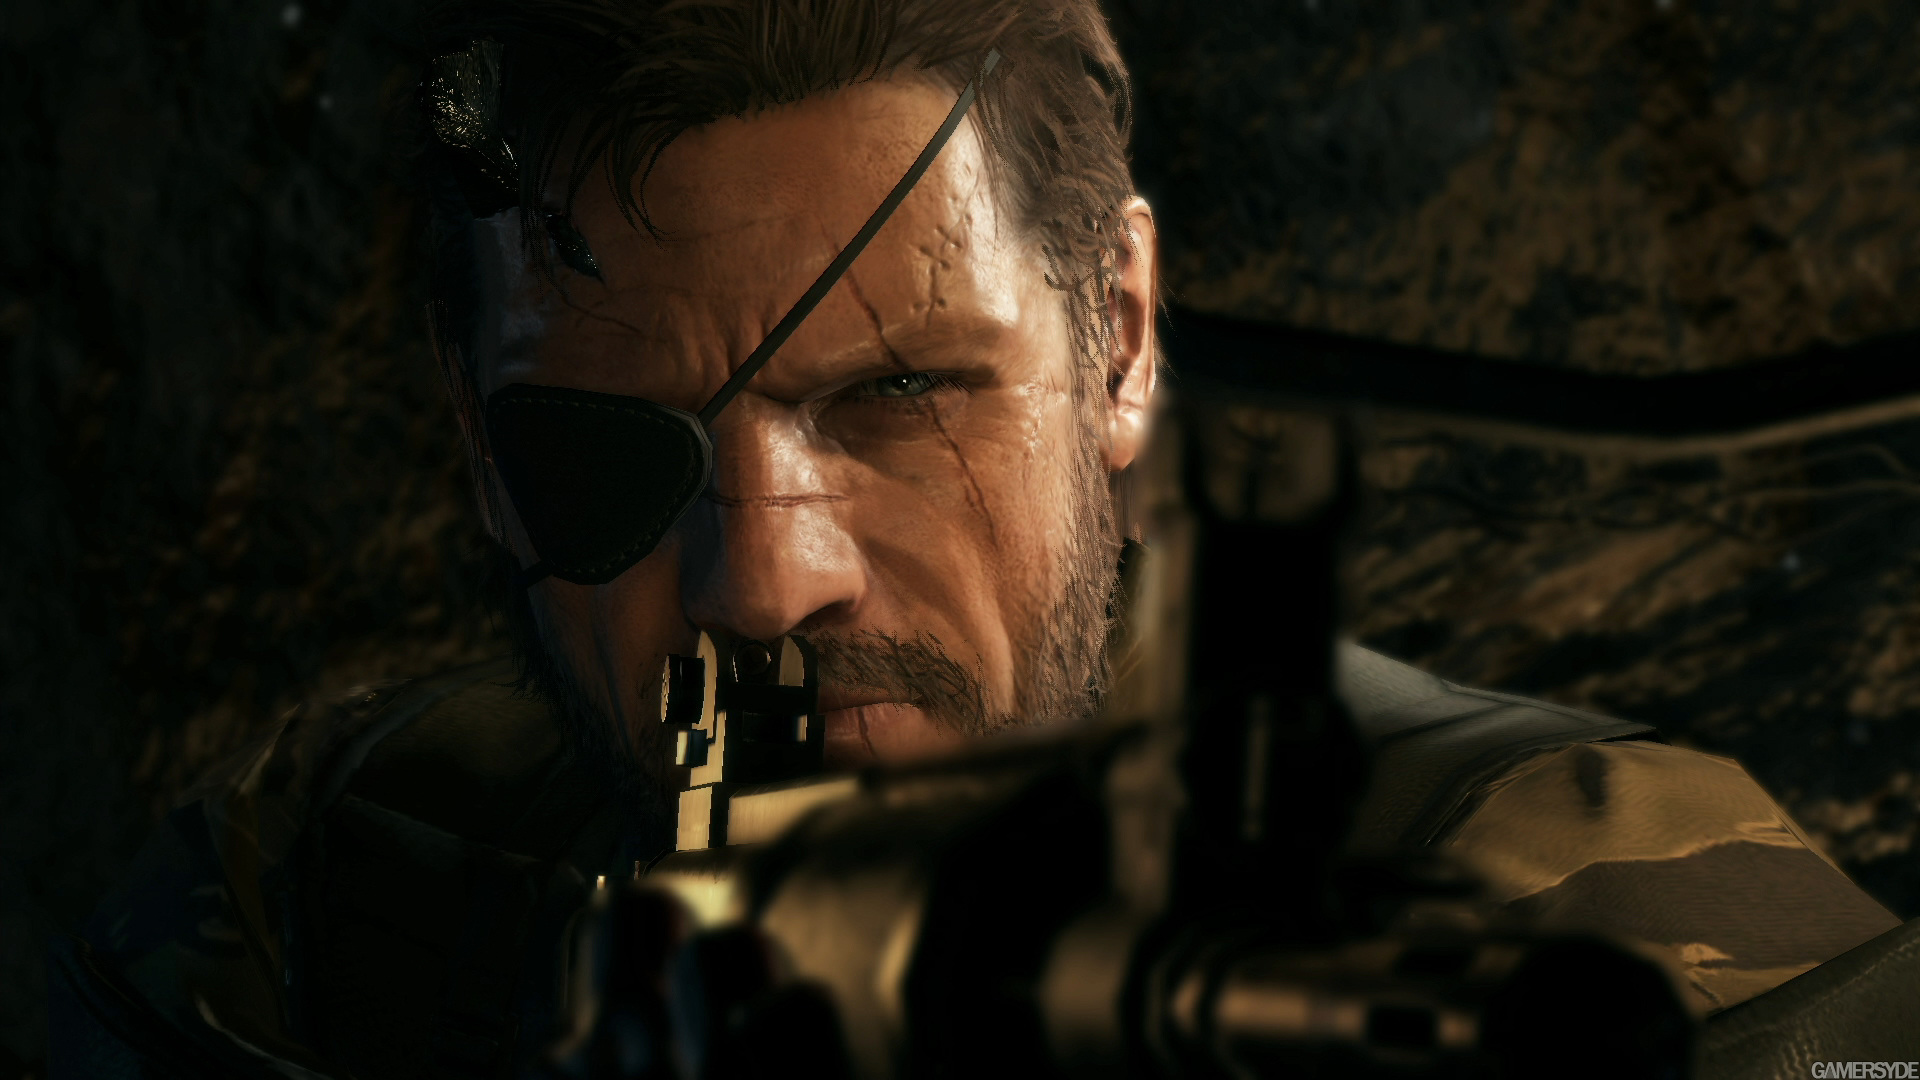 Metal Gear Solid V: The Phantom Pain Windows, XONE, X360, PS4, PS3 game